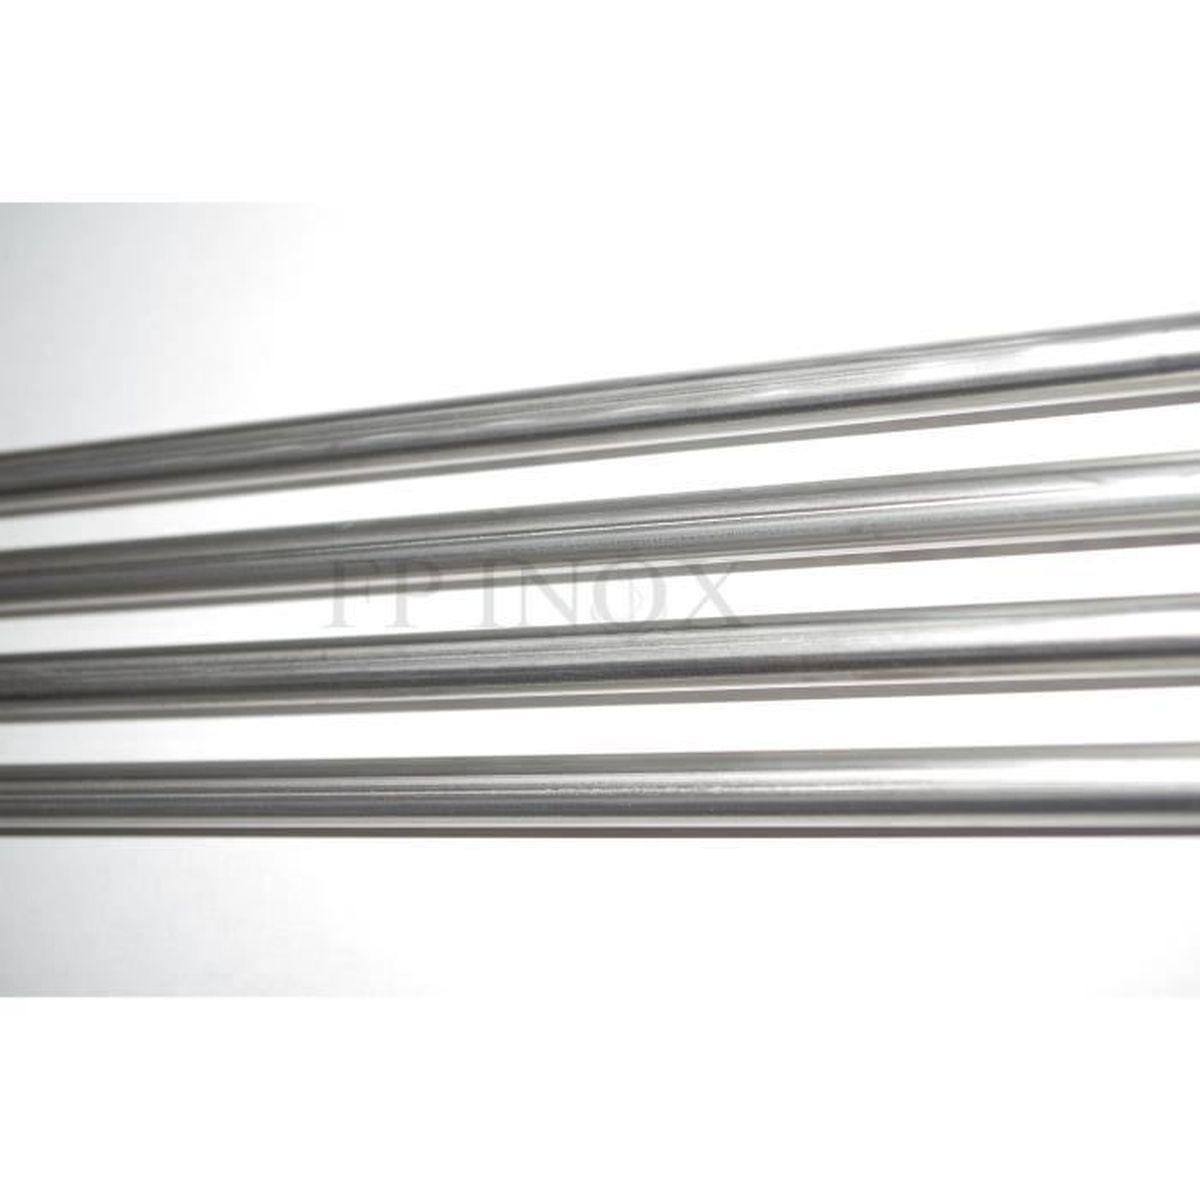 Tube inox 22mm x 1,5mm x 1 Mètre Polimiroir 316